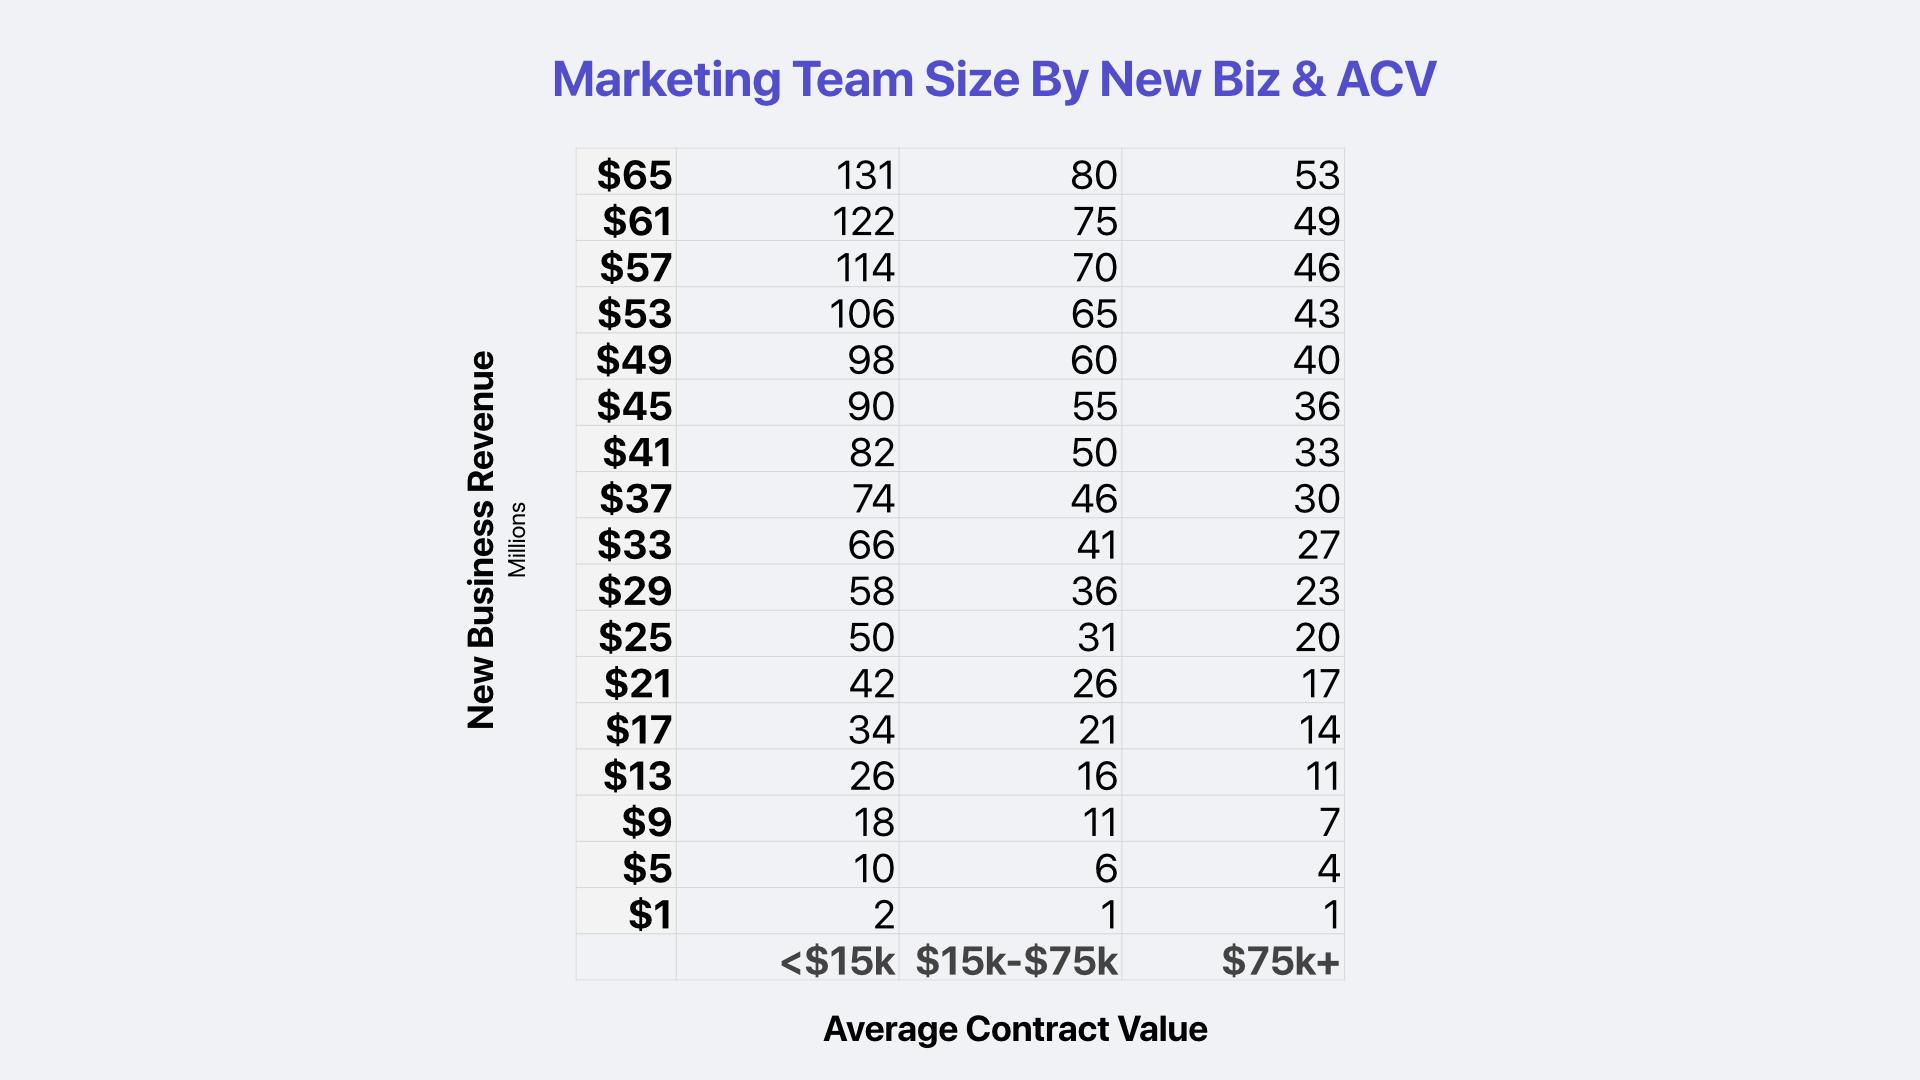 SaaS Marketing Team Size by New Biz & ACV